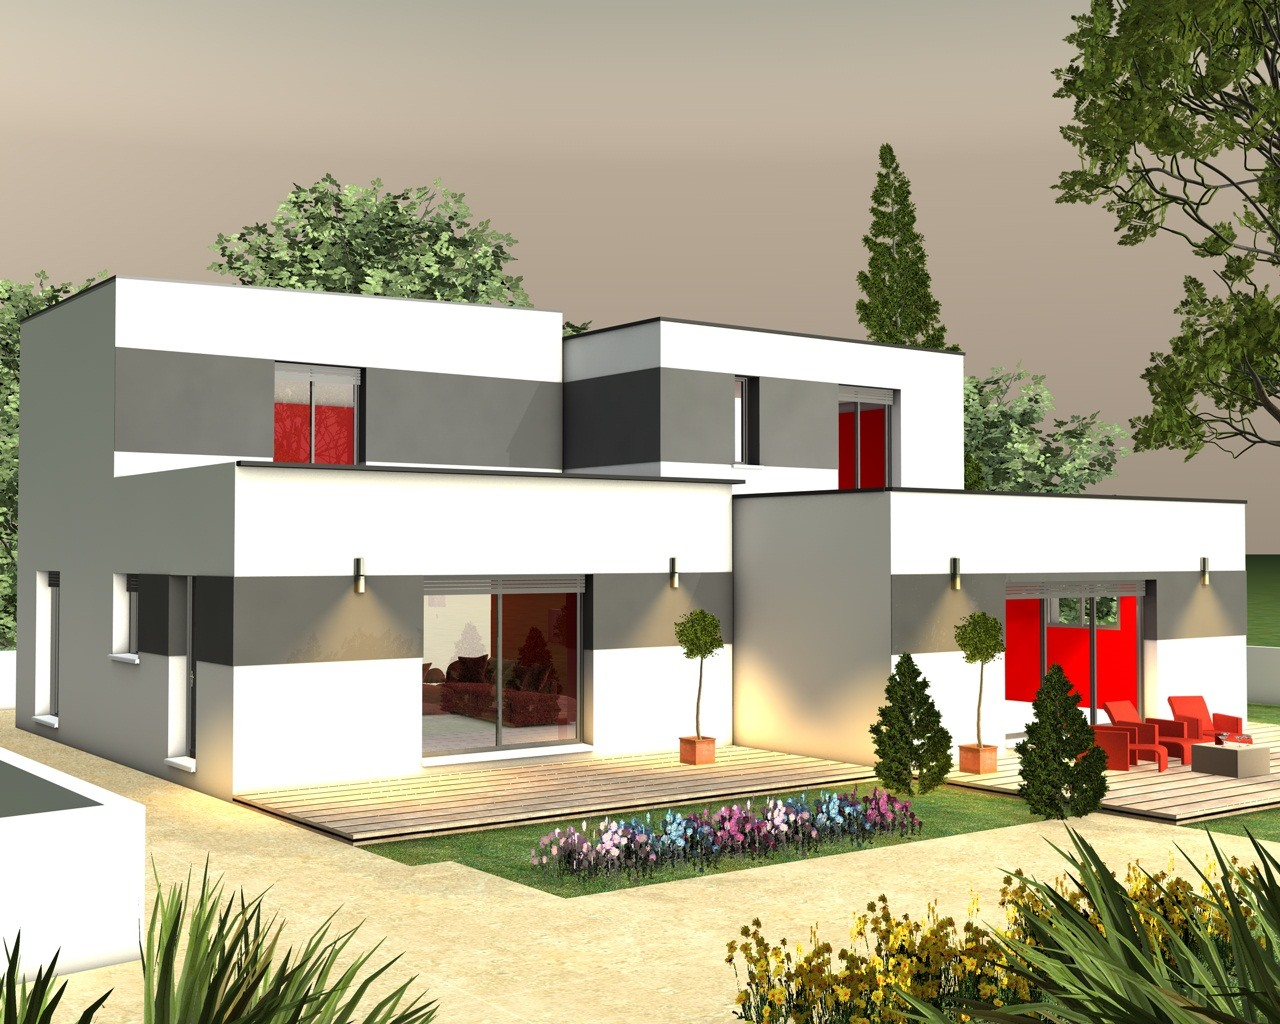 Maison 2 etage avec terrasse